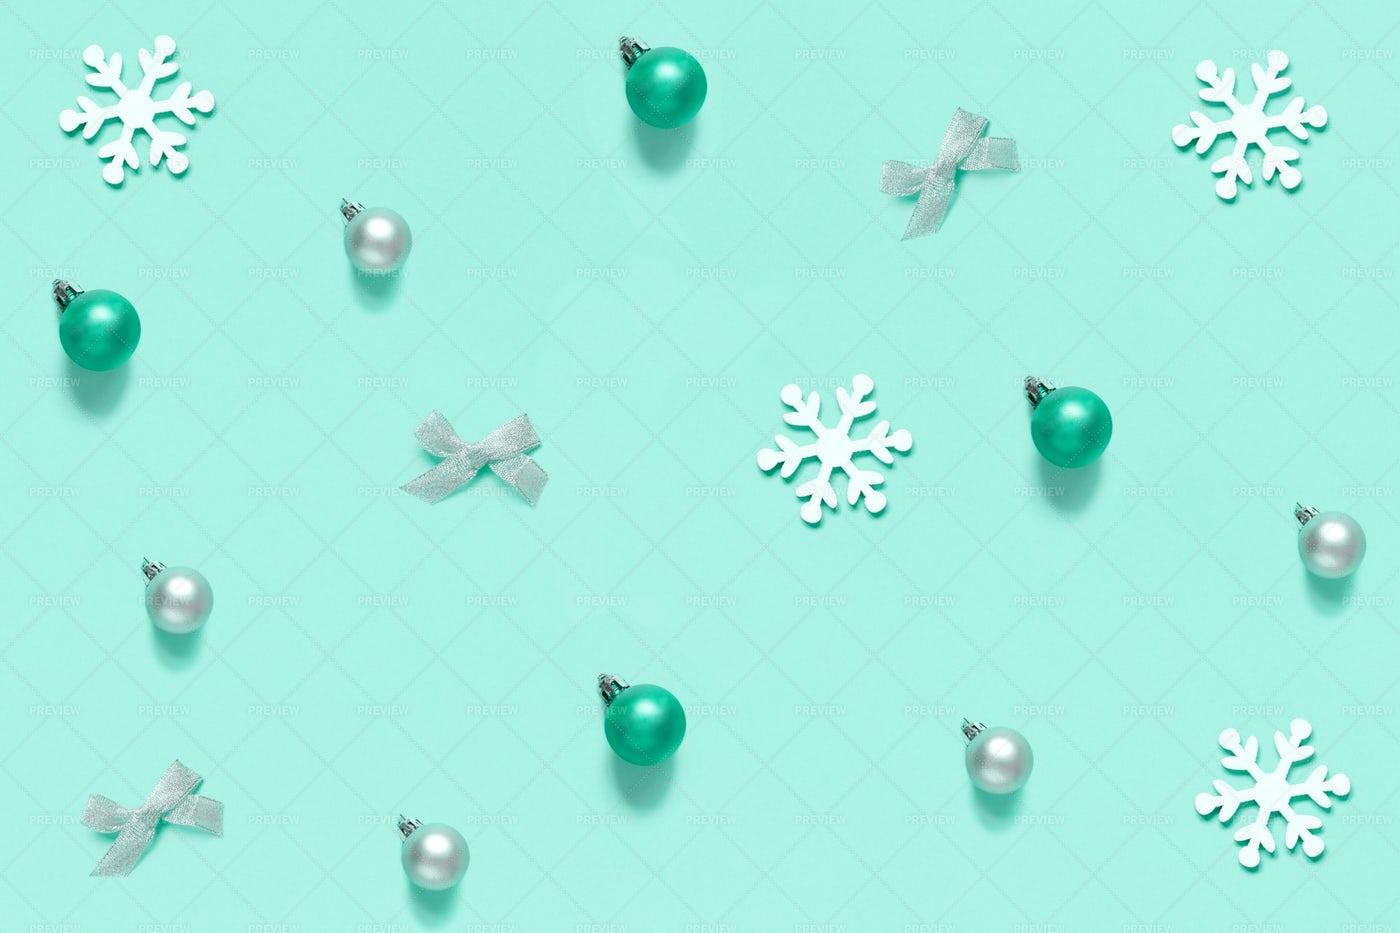 Christmas Decorations On Light Green: Stock Photos